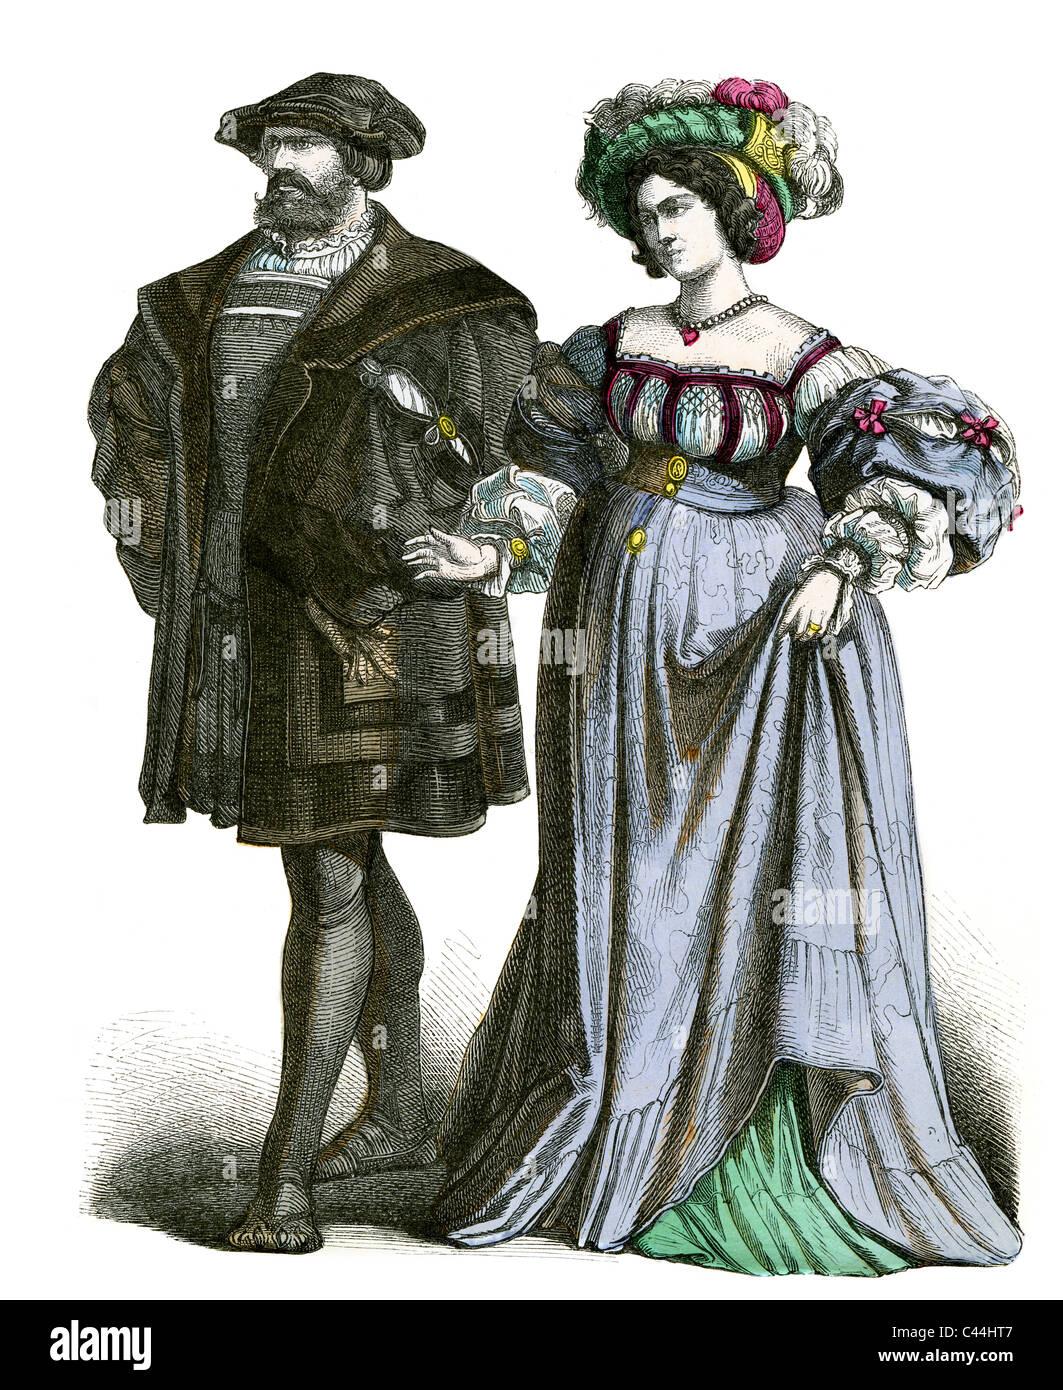 Noblemen for Clothing photos